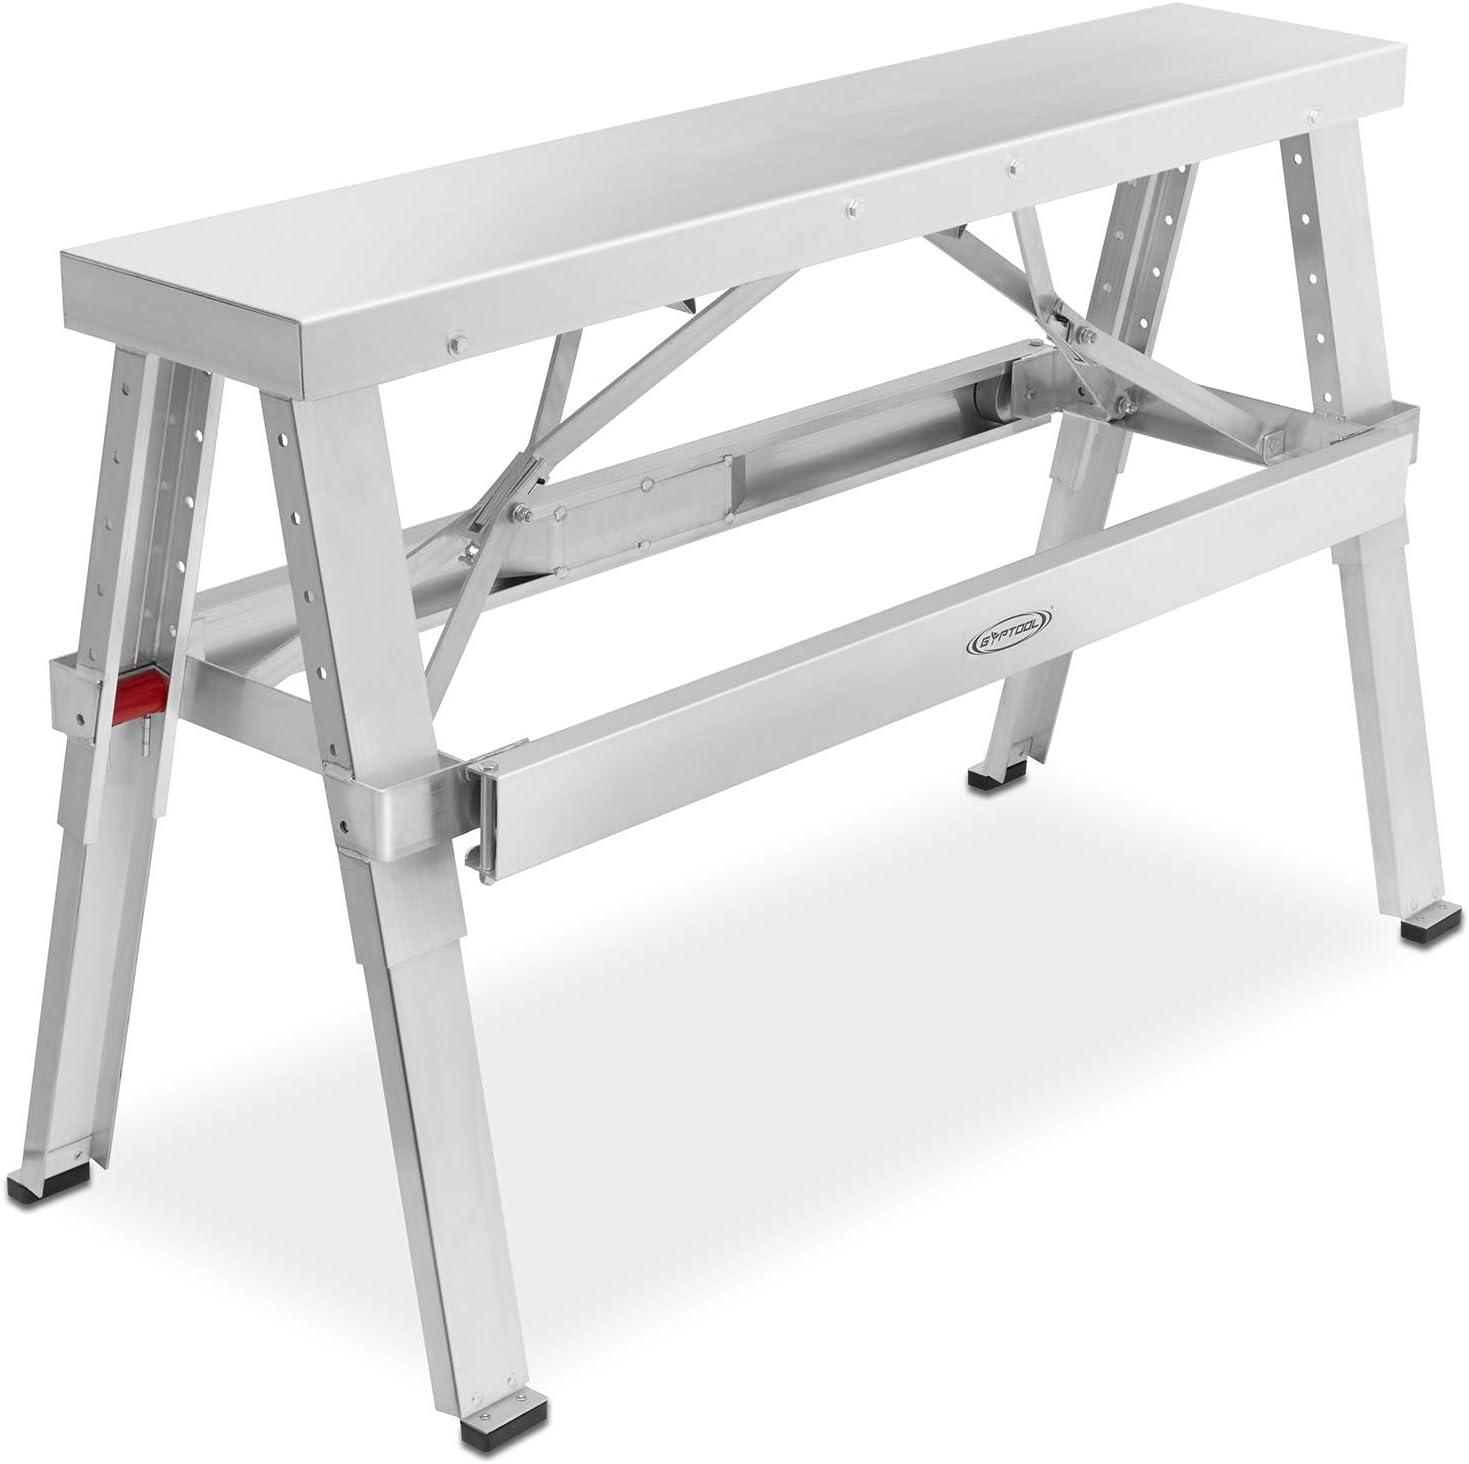 GypTool Adjustable Height Drywall Taping & Finishing Walk-Up Bench